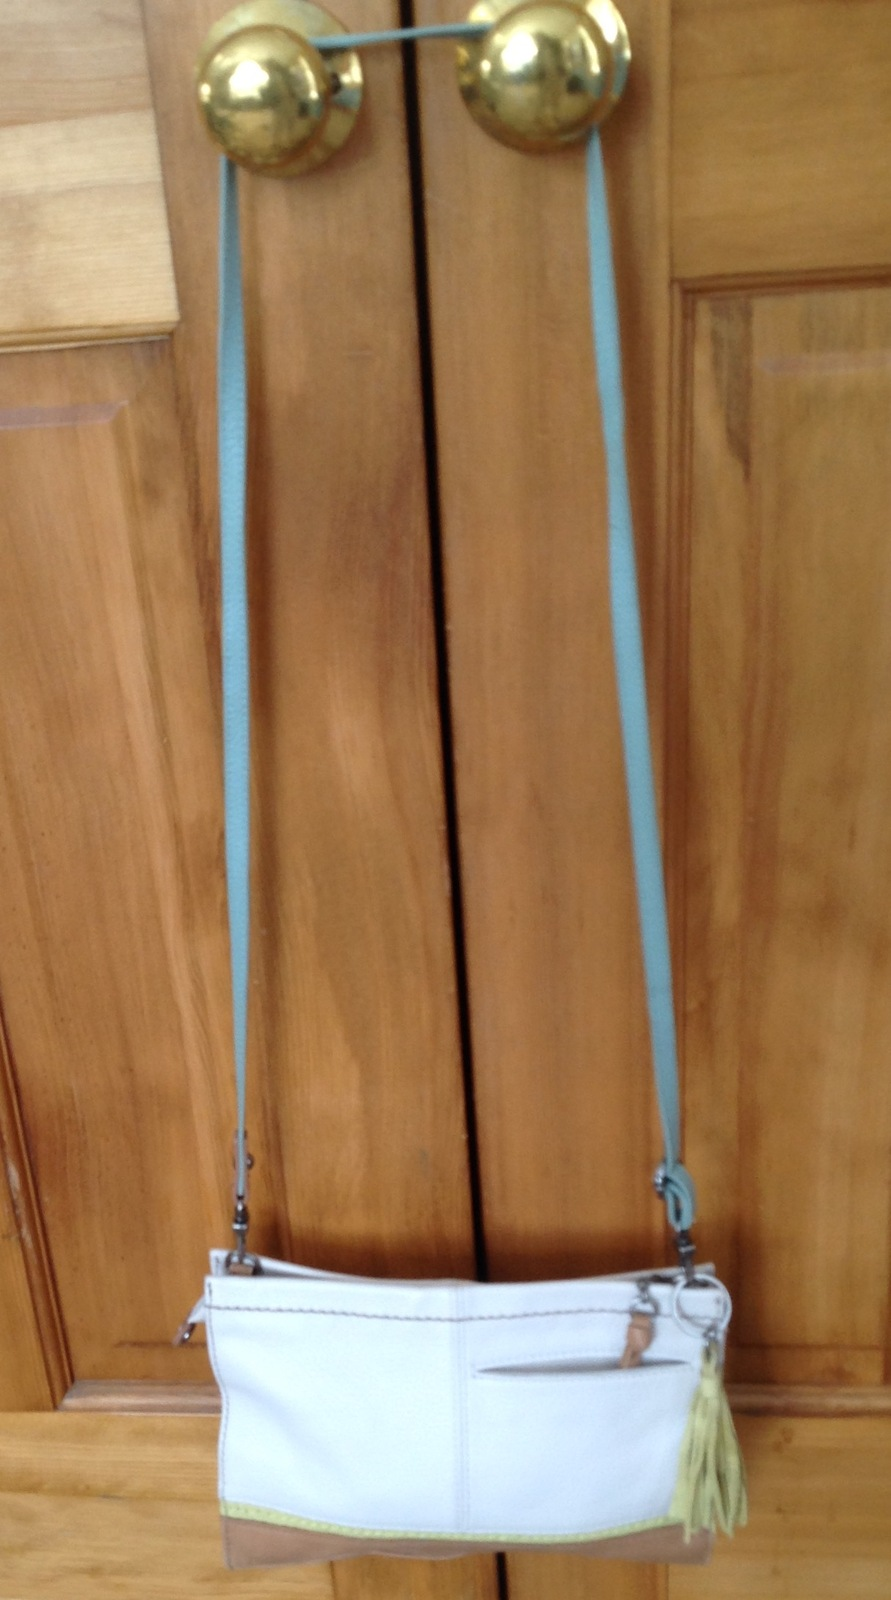 349c3ad9ddb6 The Sak Iris Multi-Color beige lime blue white crossbody clutch leather  handbag